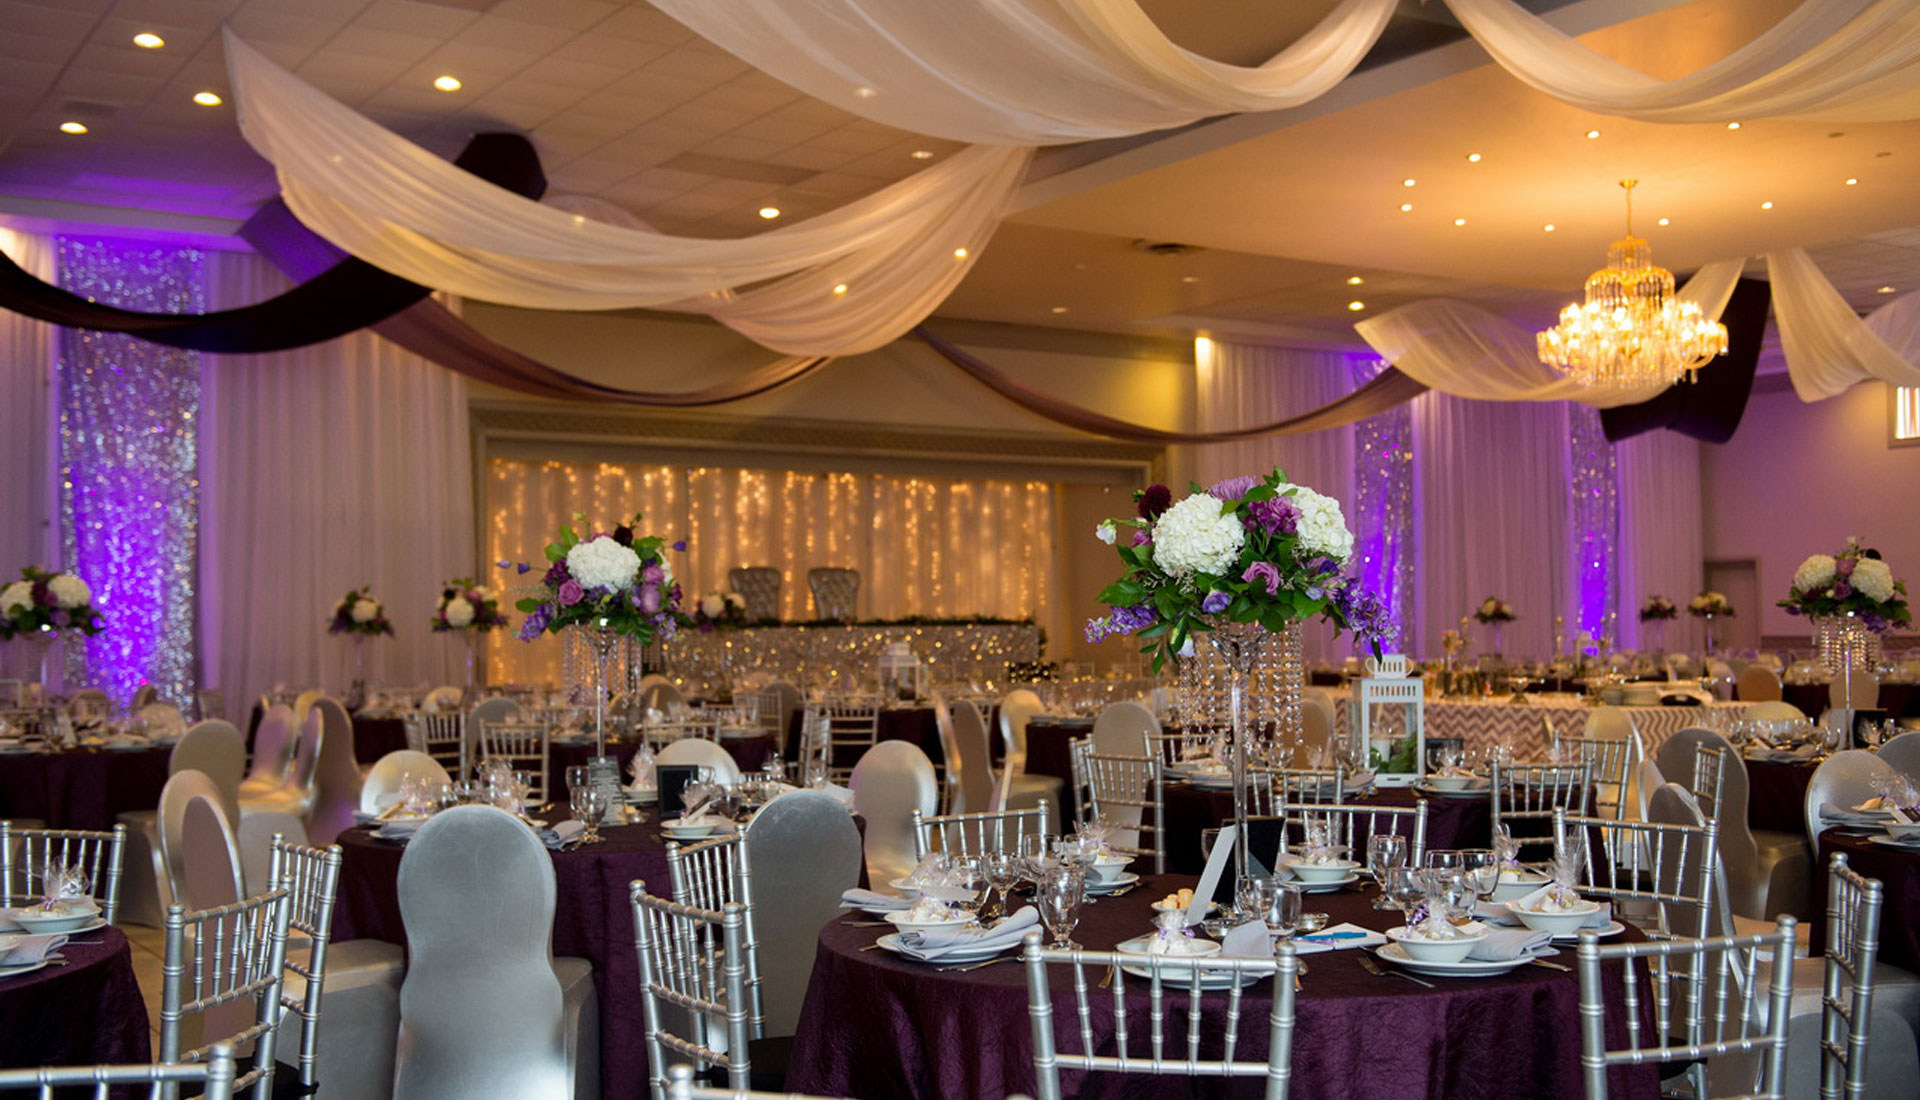 Wedding Dream  wedding decorations and rentals